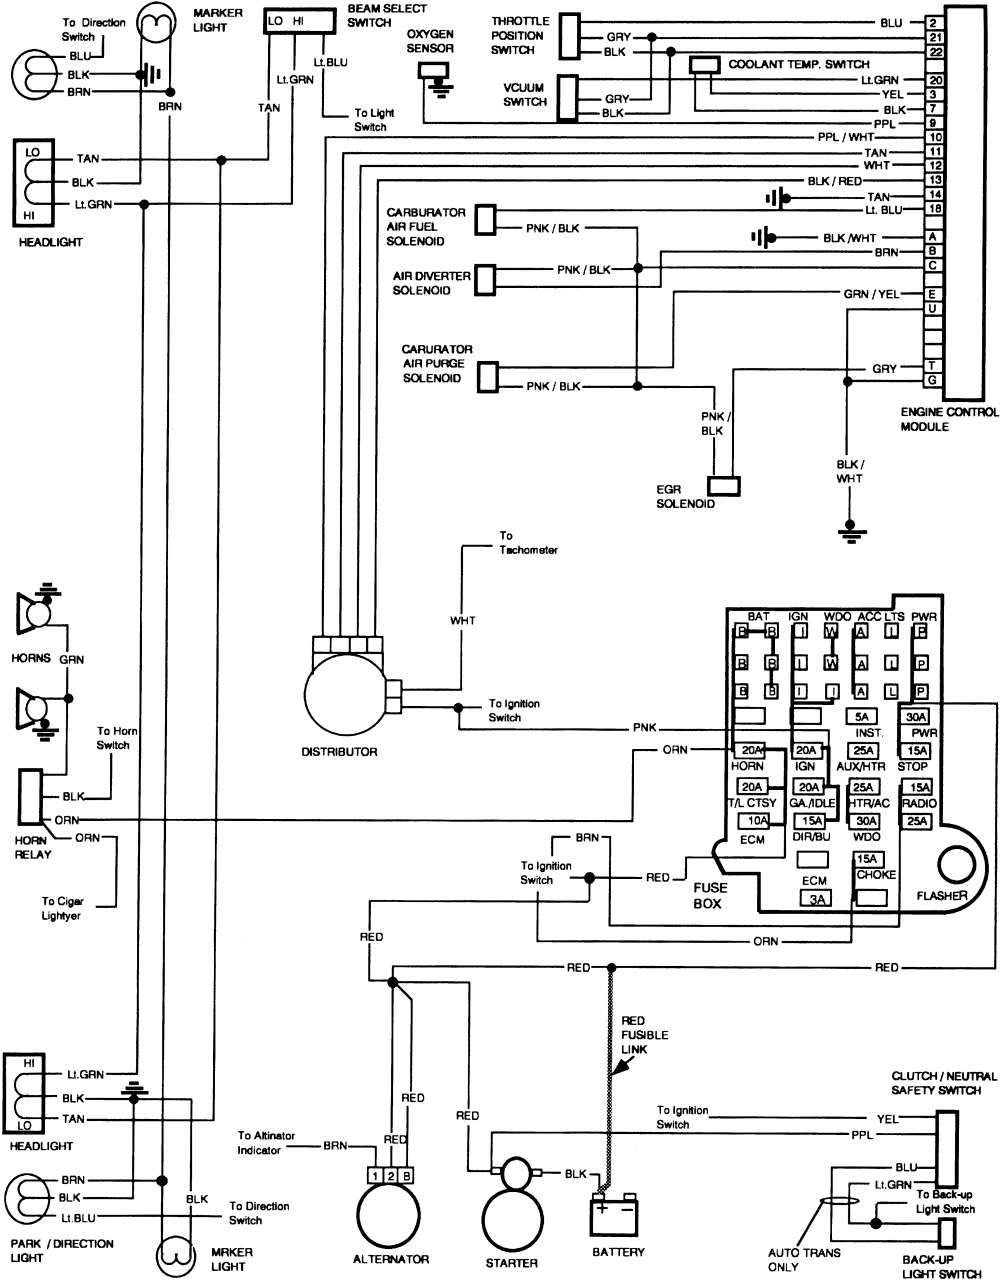 medium resolution of wiring diagram cars trucks wiring diagram cars trucks truck horn 1986 chevy truck horn wiring diagram chevy truck horn wiring